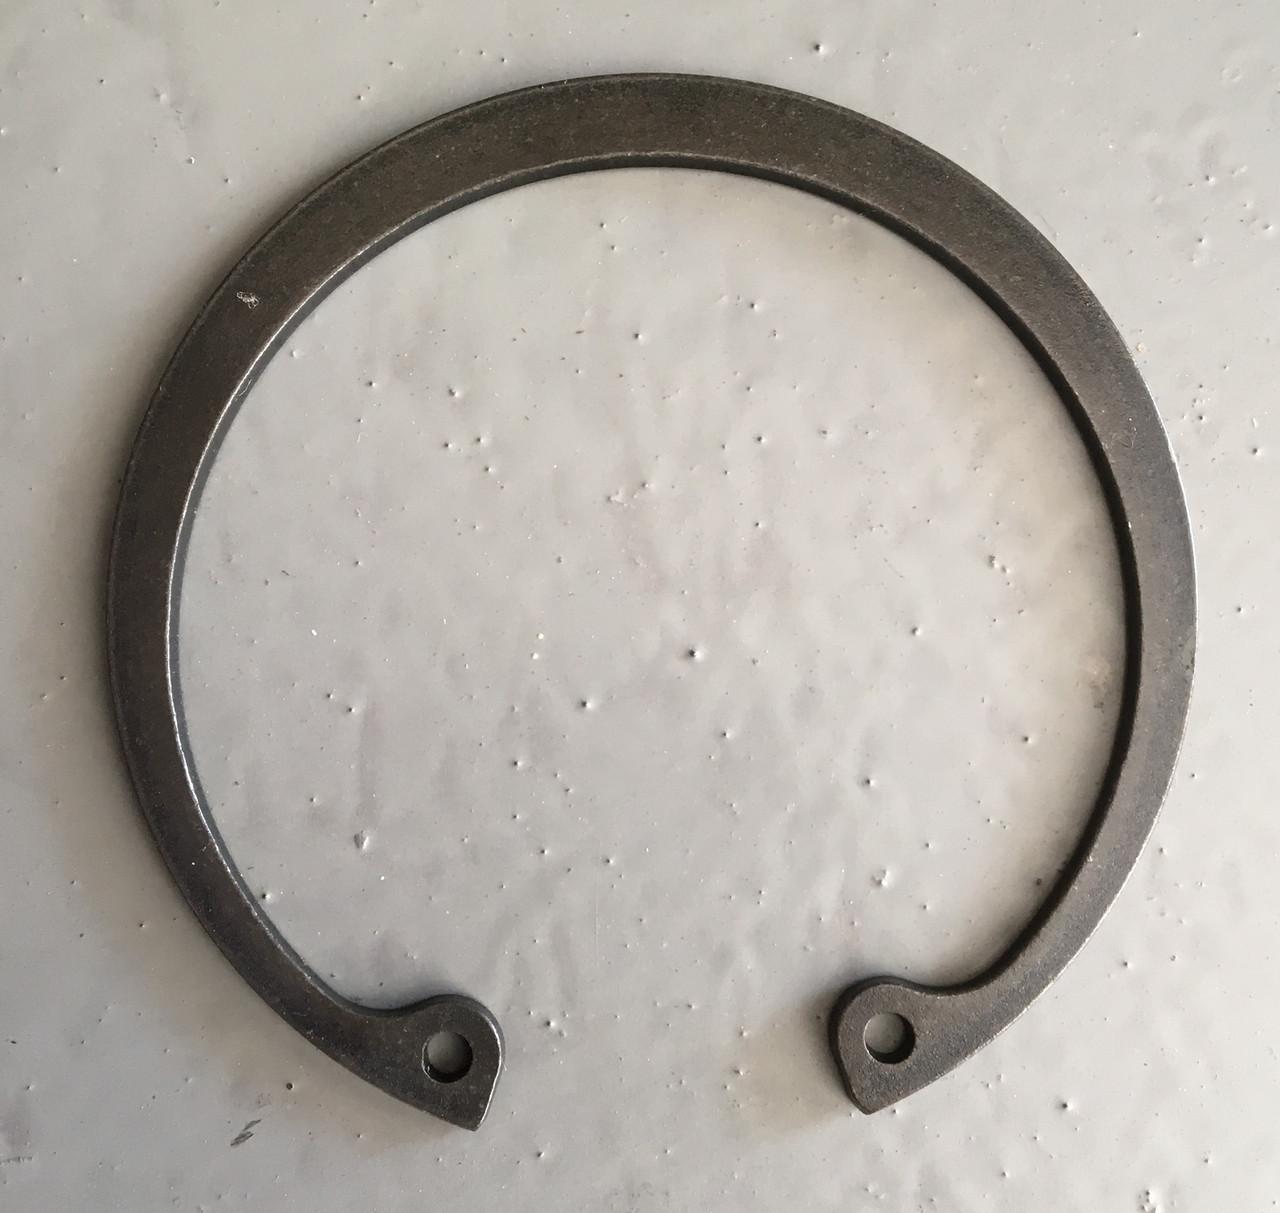 Кольцо стопорное В-62 внутреннее Z-169